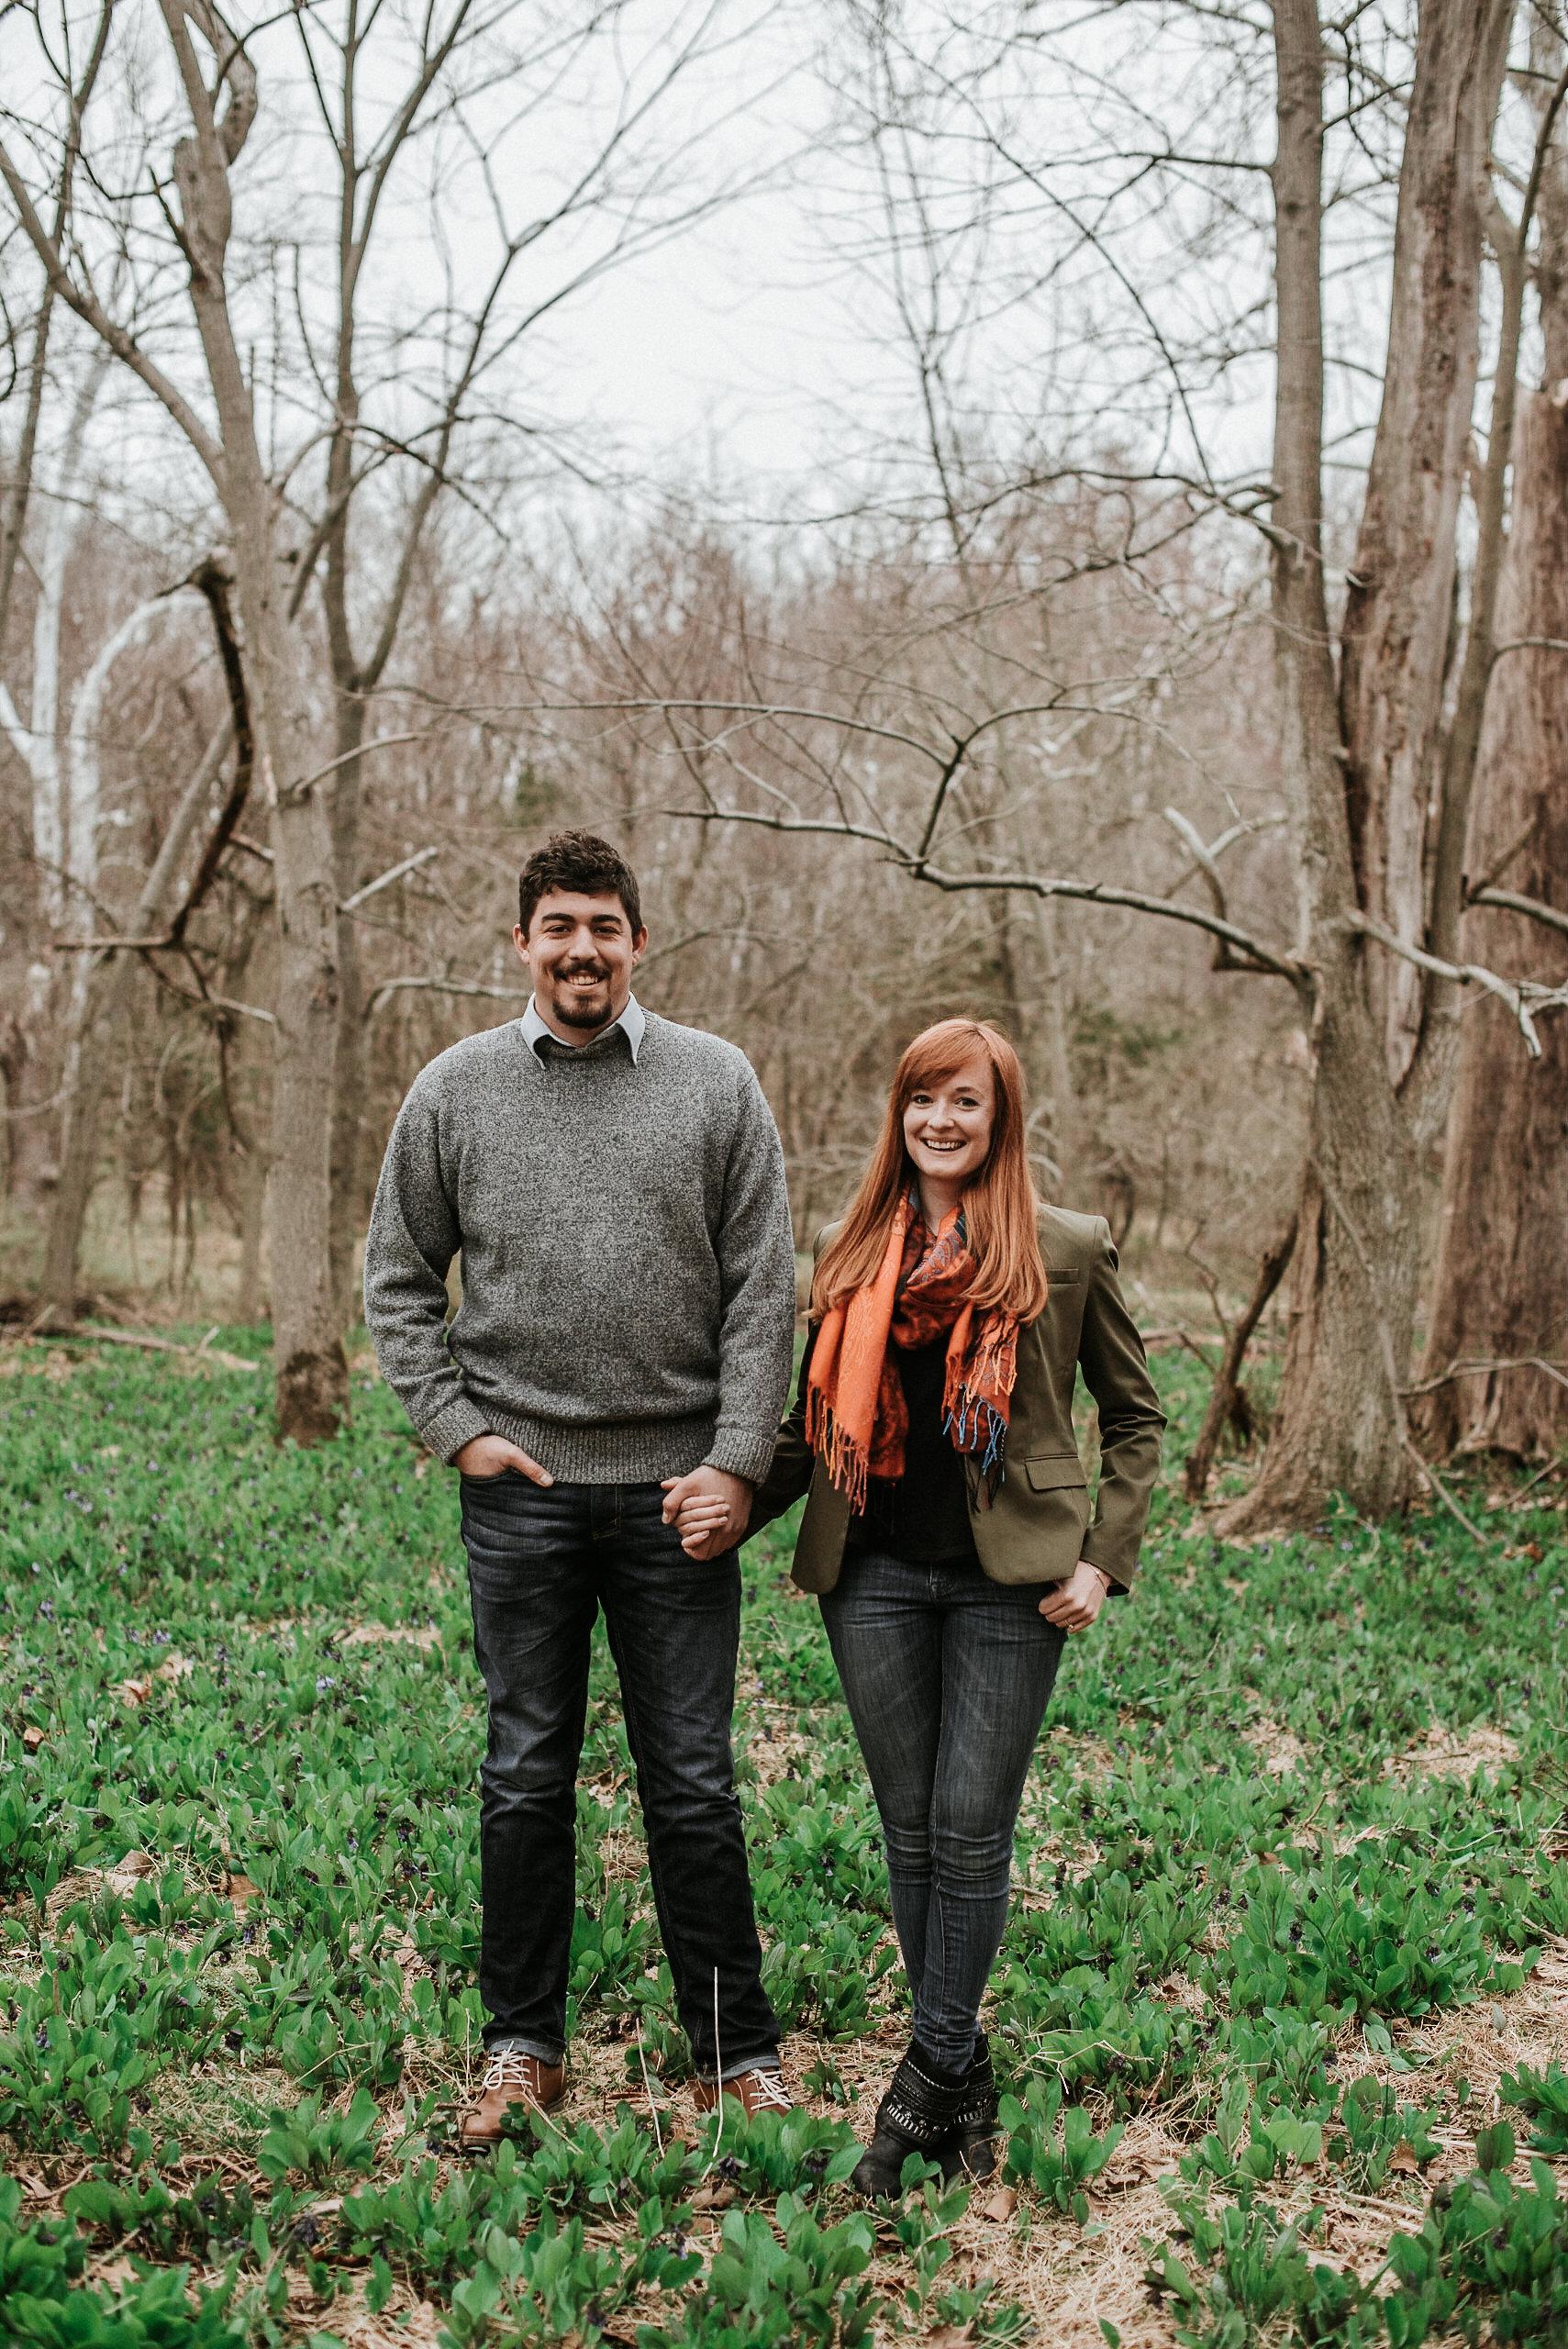 Couple standing together among trees